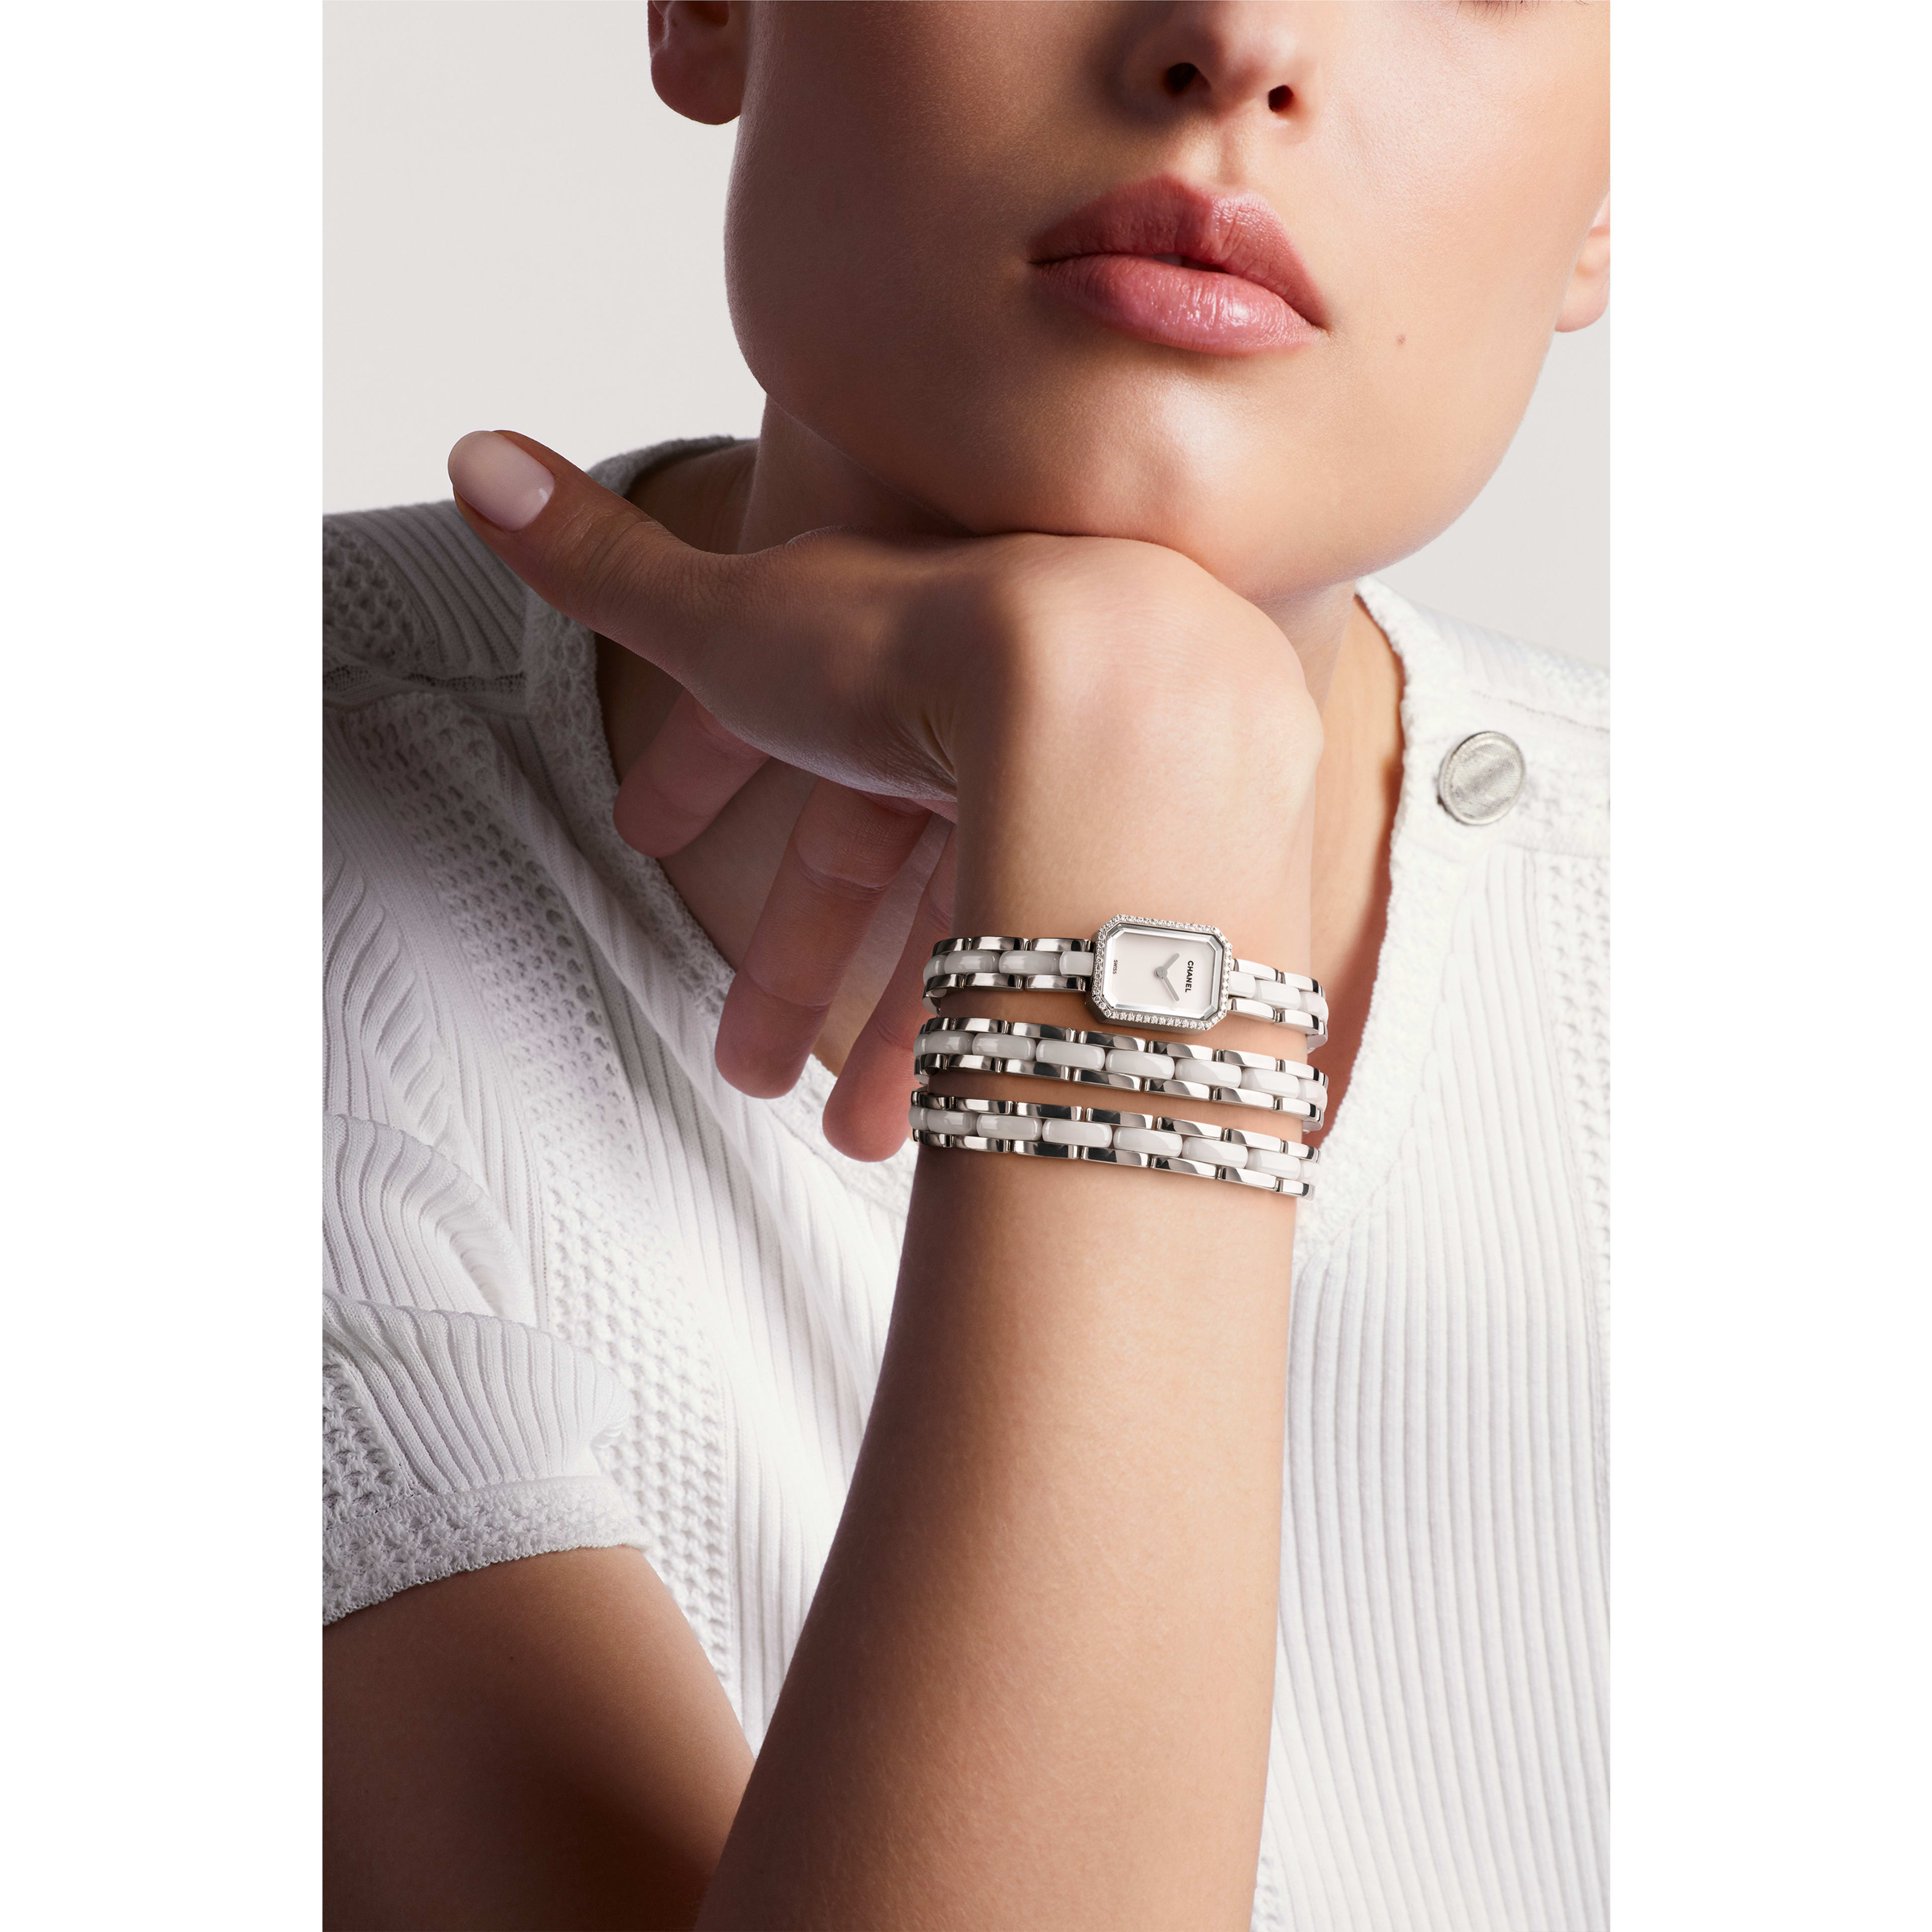 Première Mini腕錶 - 三圈精鋼和白色高抗磨陶瓷,鑽石,白色漆面錶盤 - 佩戴視圖